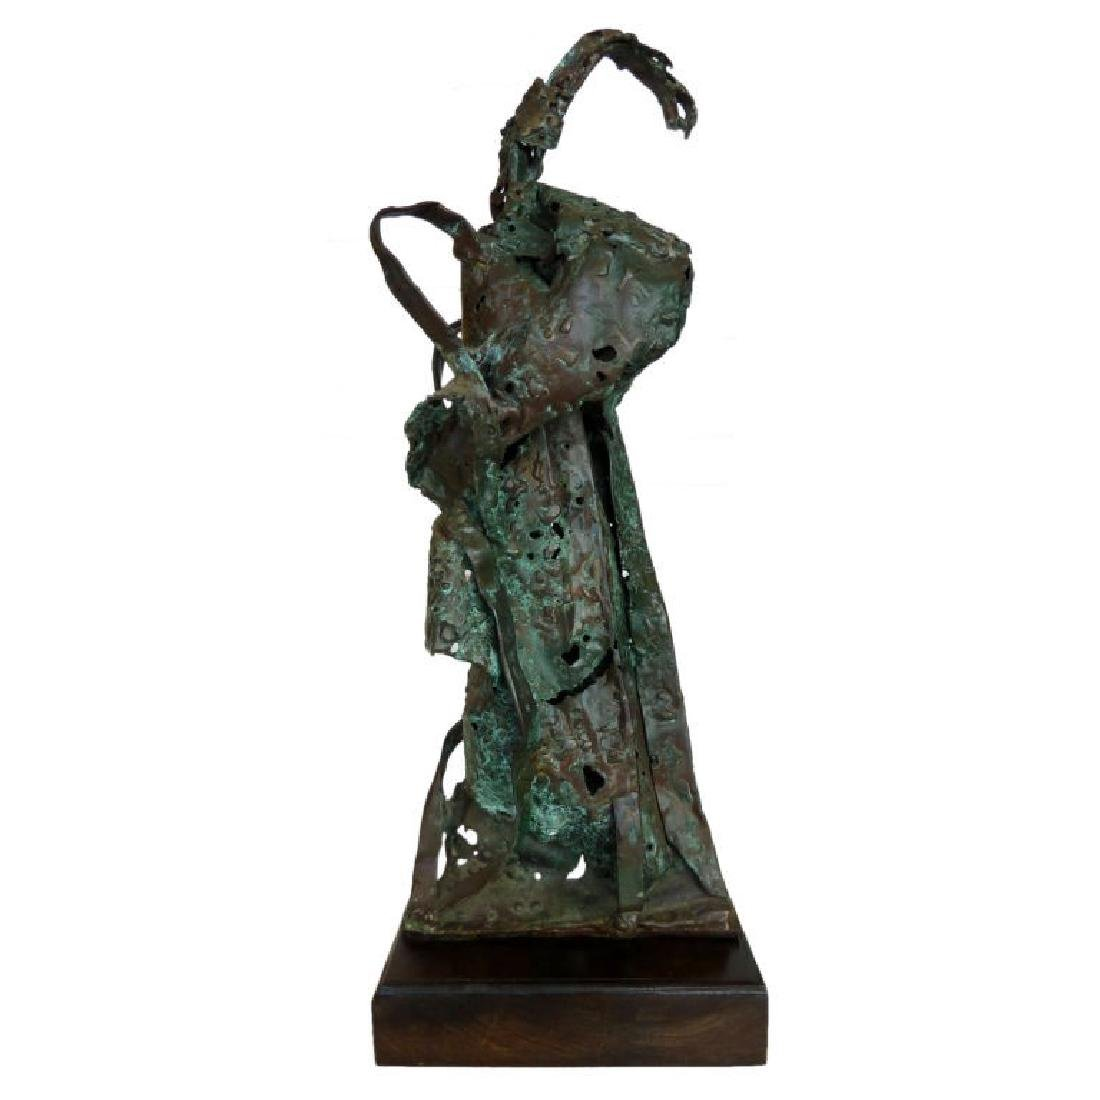 Expressionist Bronze Sculpture by Howard Quam